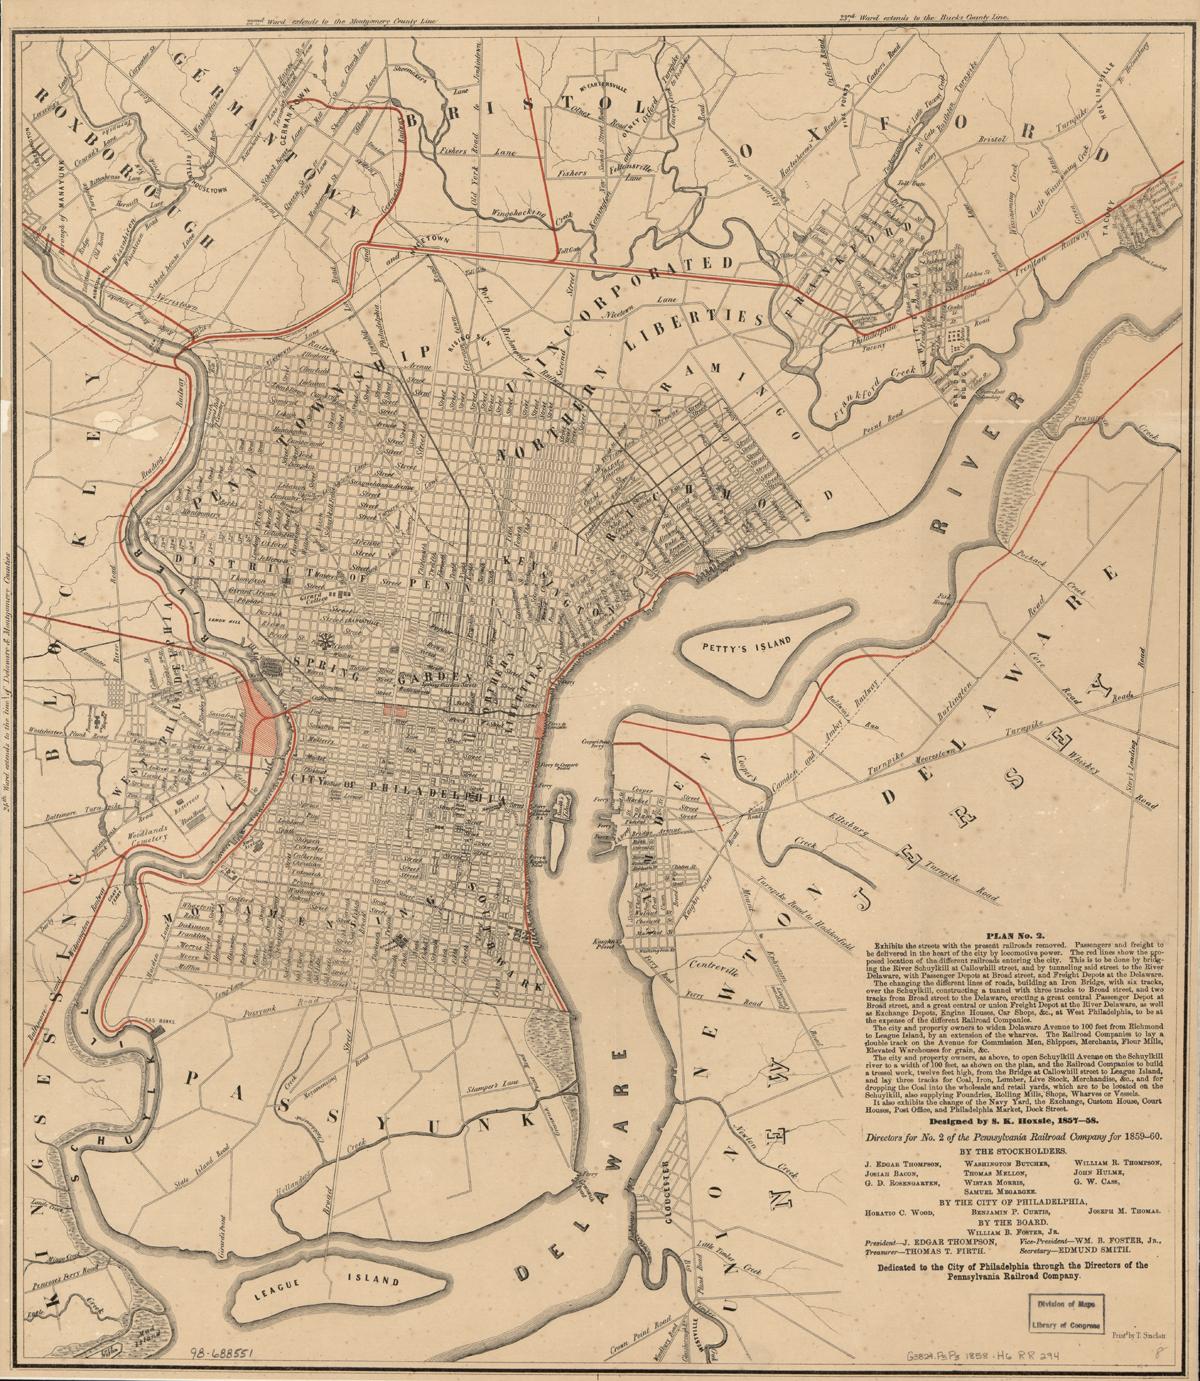 Philidelphia 1858